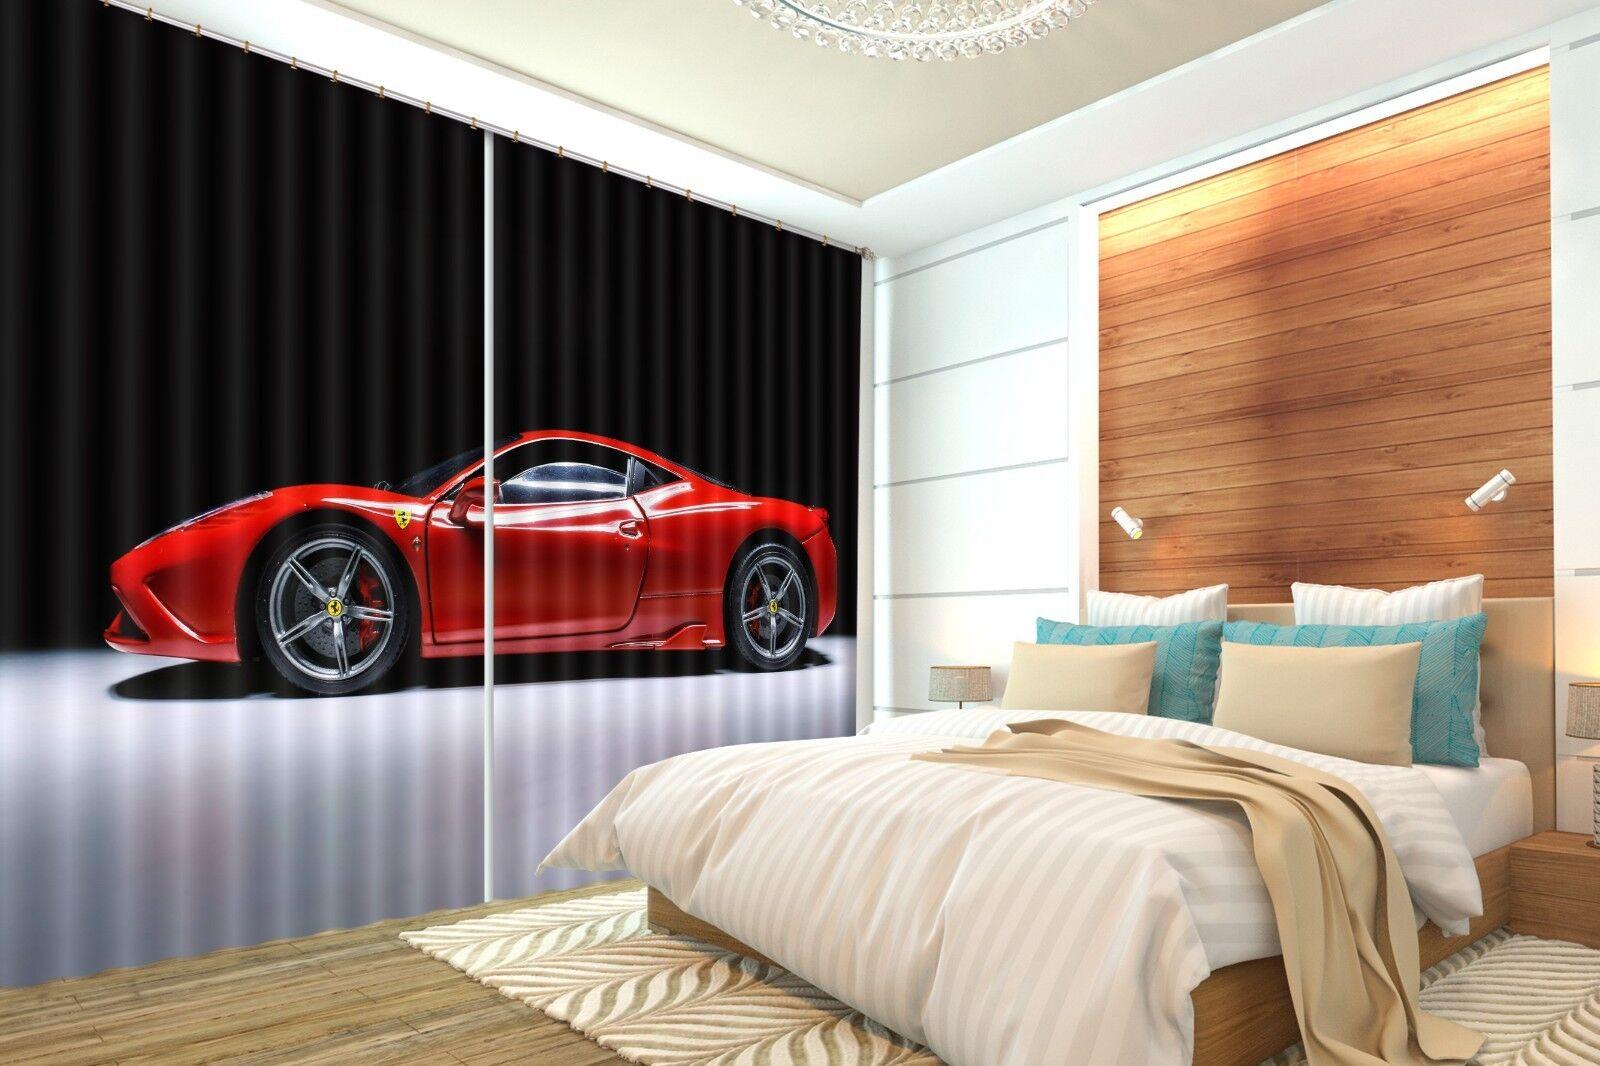 3D Coche Rojo 73 Cortinas de impresión de cortina de foto Blockout Tela Cortinas Ventana CA